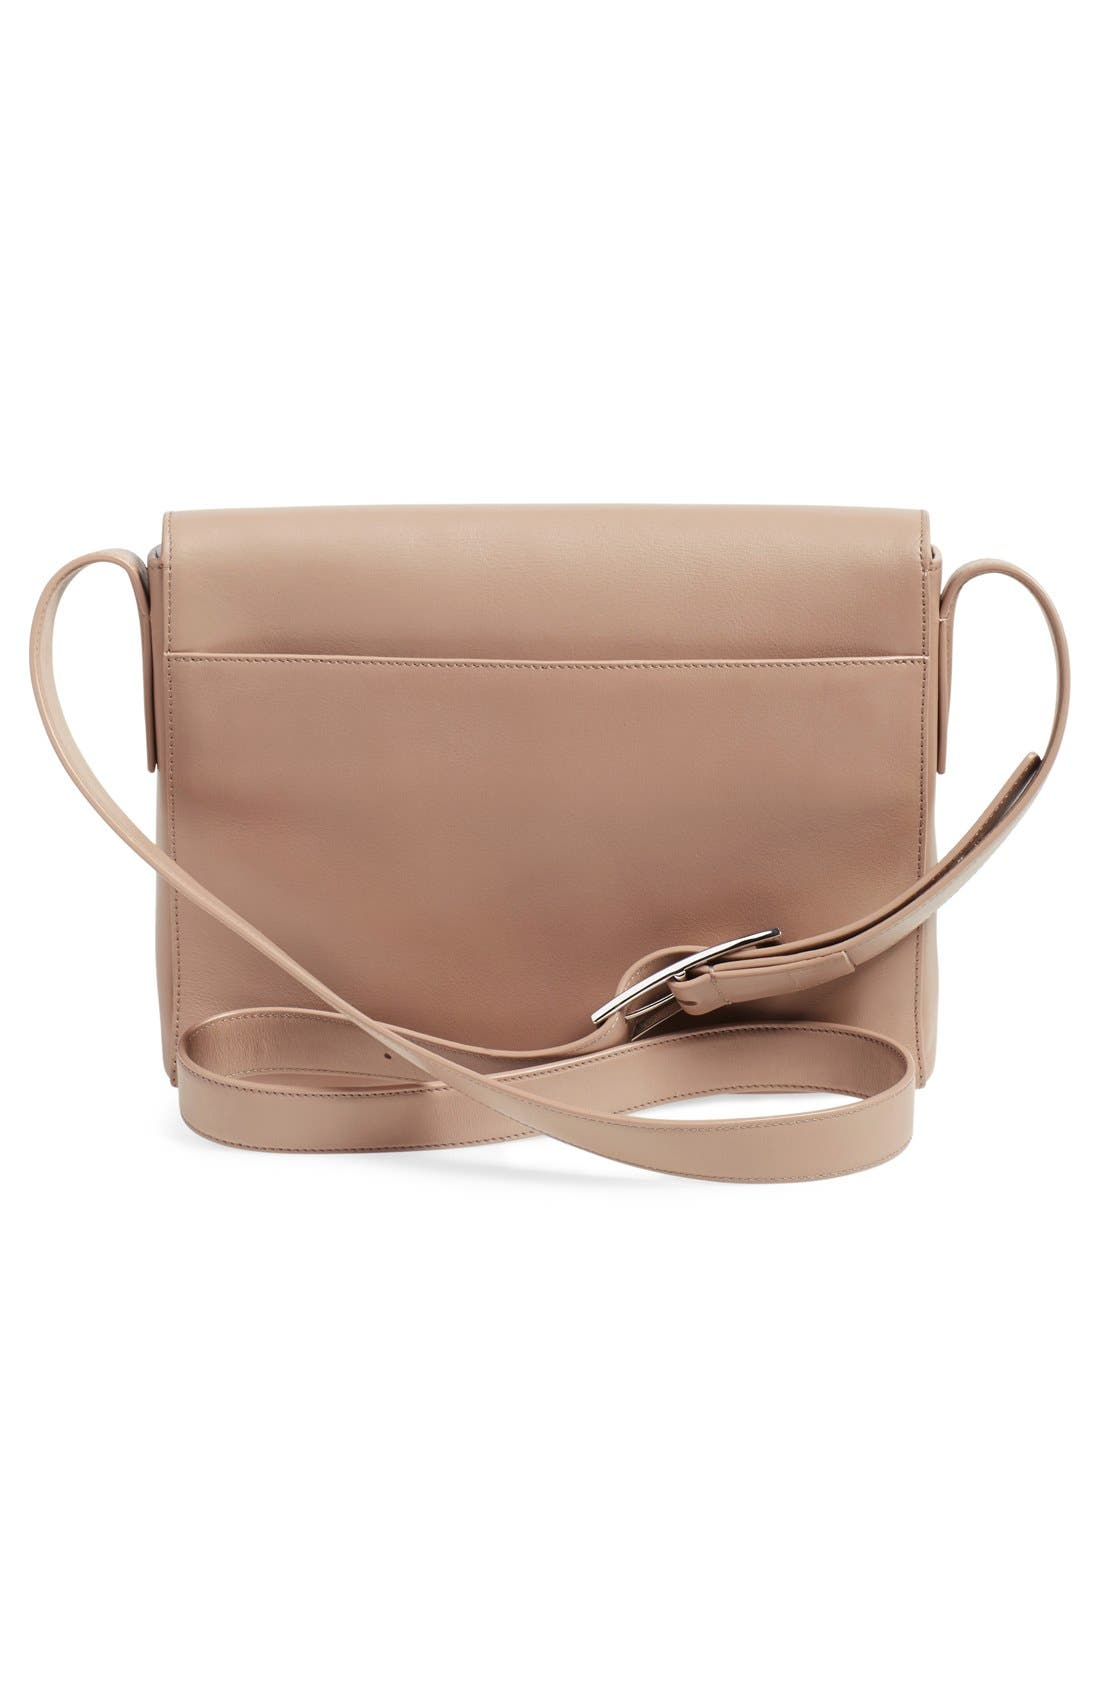 Alternate Image 3  - Vince 'Medium Signature' Leather Crossbody Bag